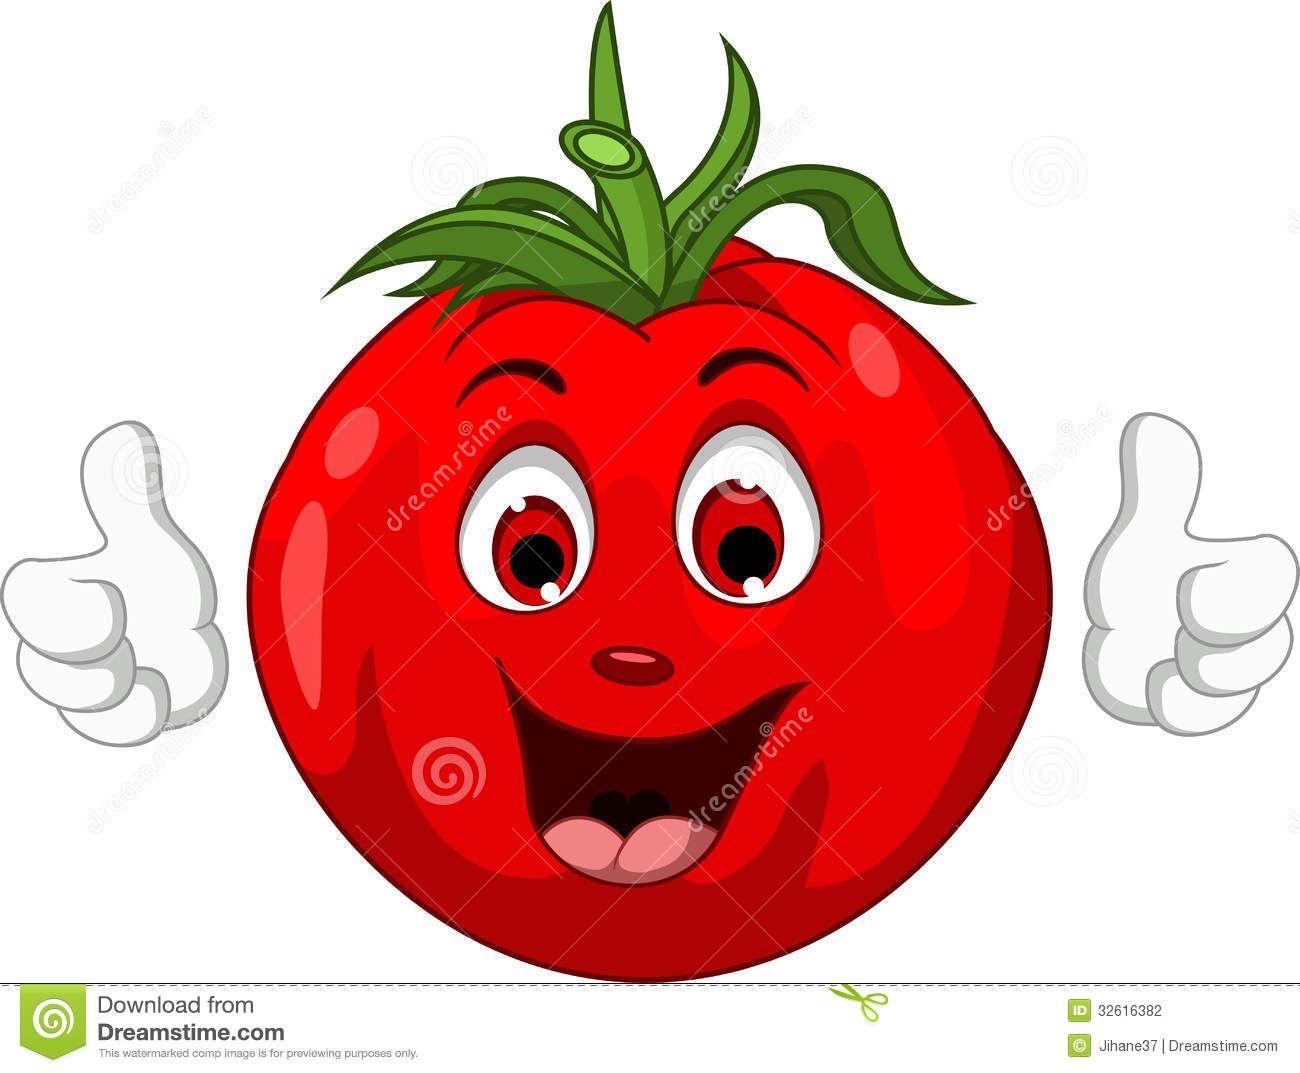 Imagem Relacionada Cute Tomato Cartoon Tomato Cartoon Plant Cartoon